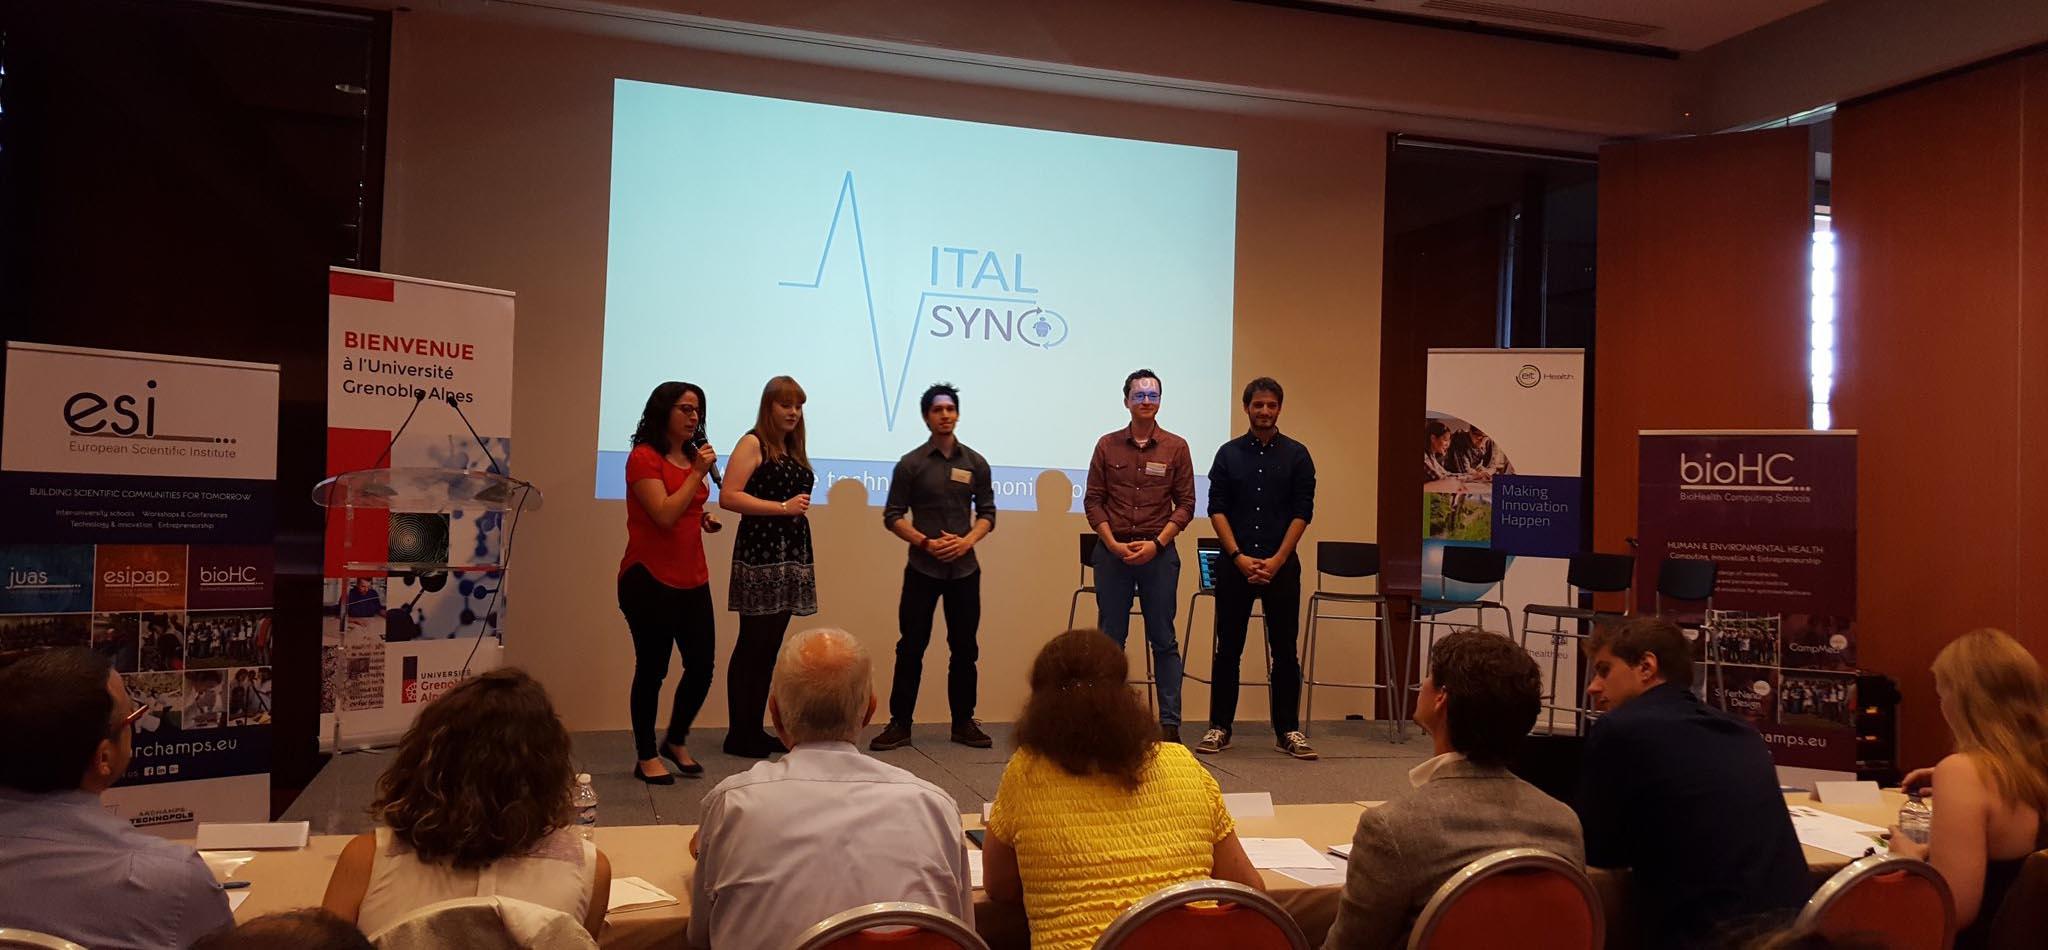 Projet Vital Sync IBD4HEALTH